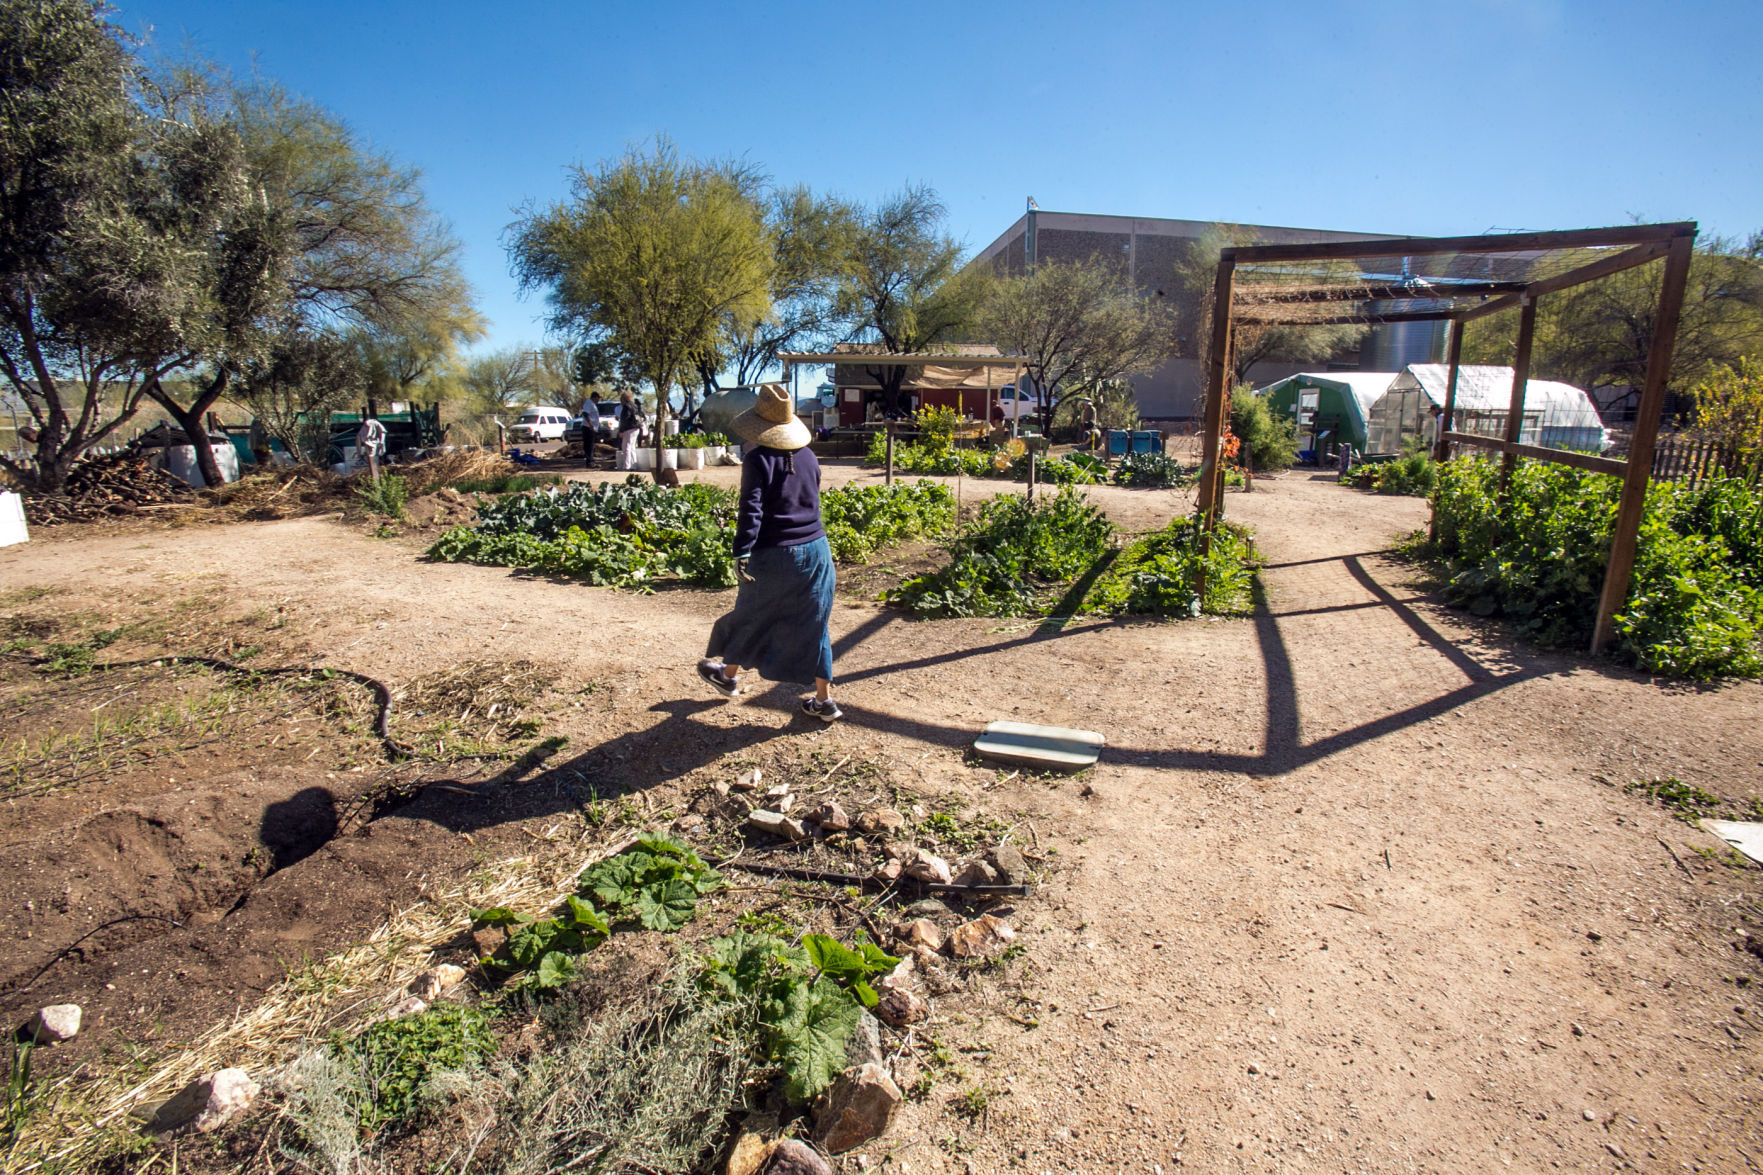 Merveilleux Community Food Garden